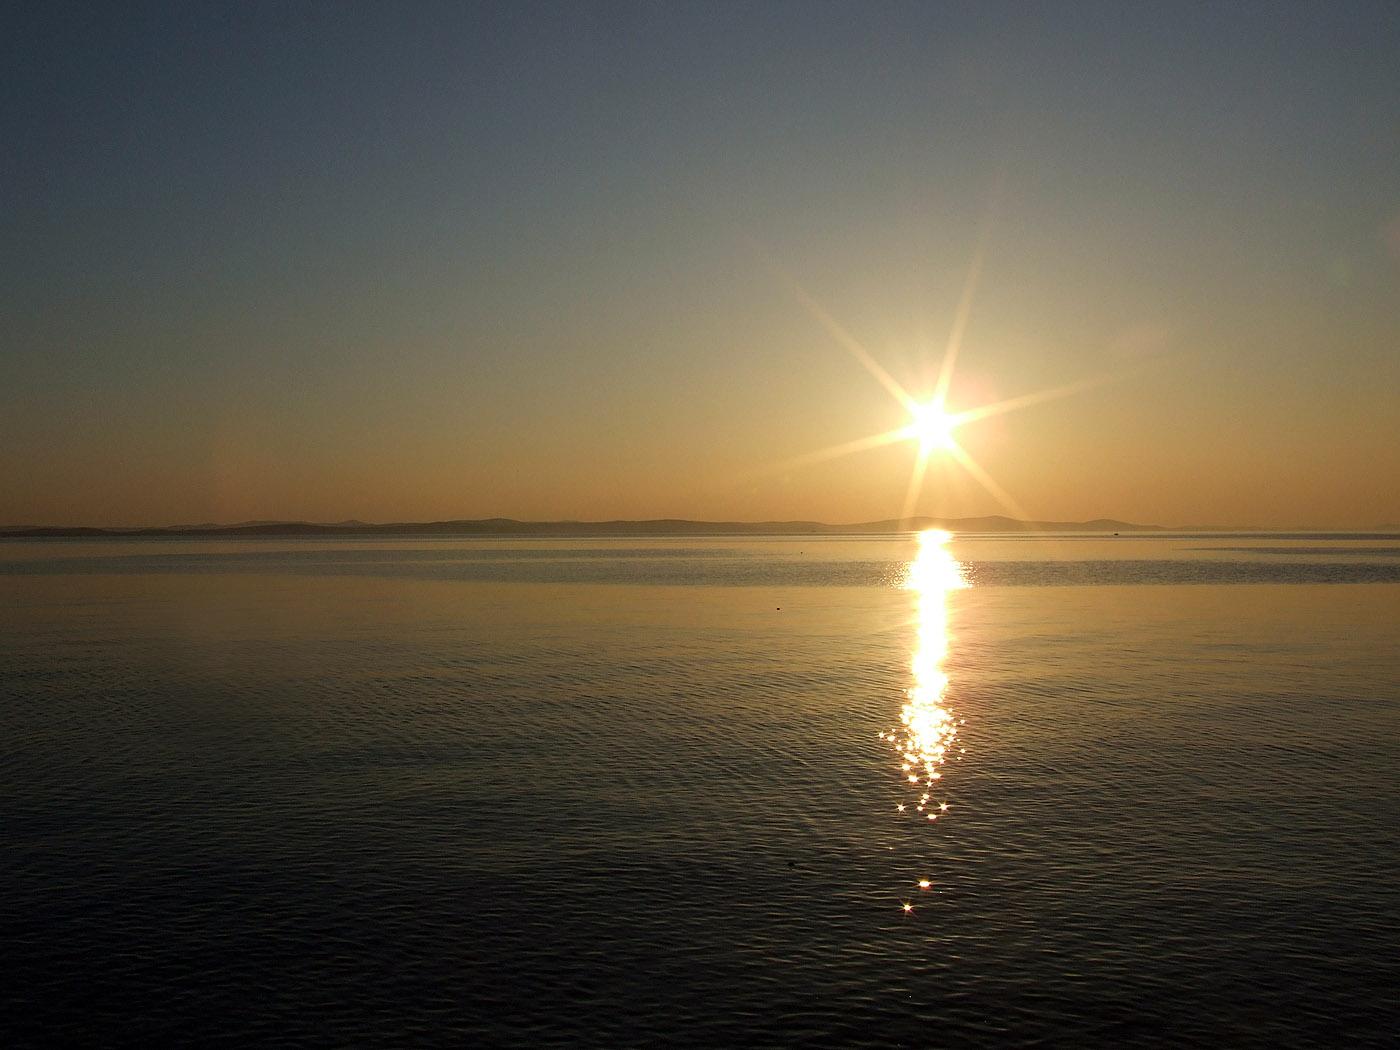 Sonnenuntergang Am Meer Kostenloses Hintergrundbild